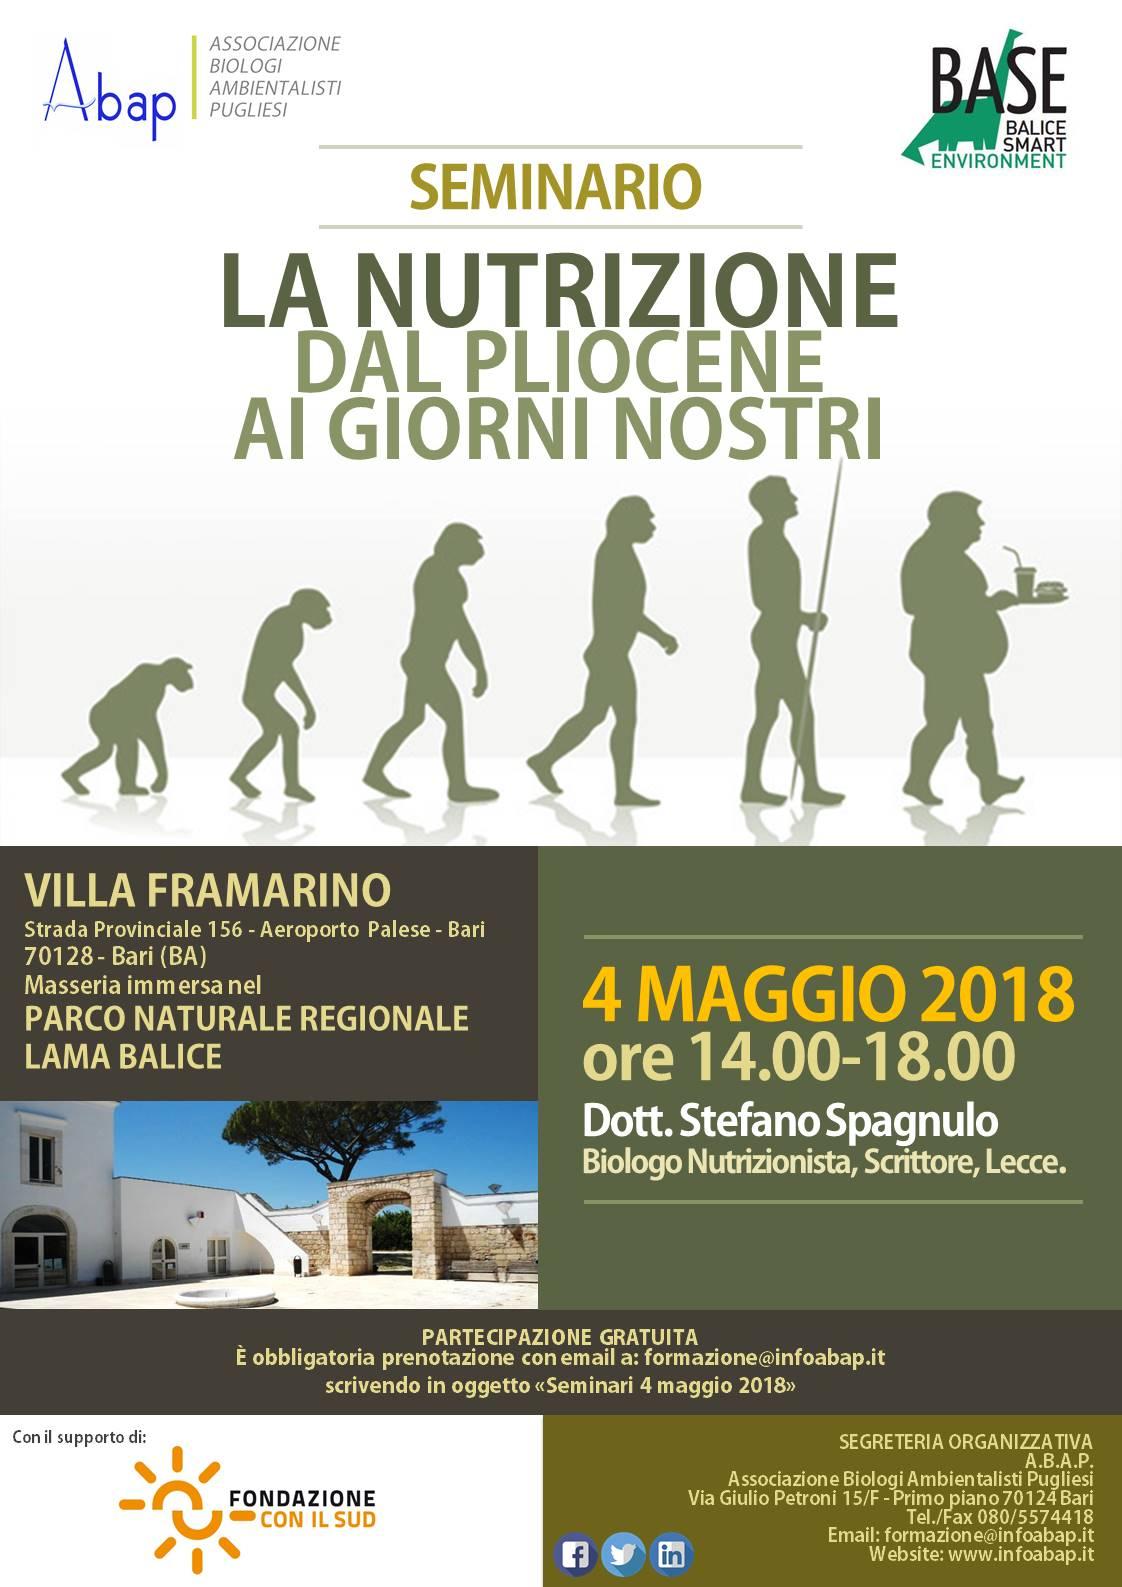 locandina-seminario-4-maggio-2018_abap